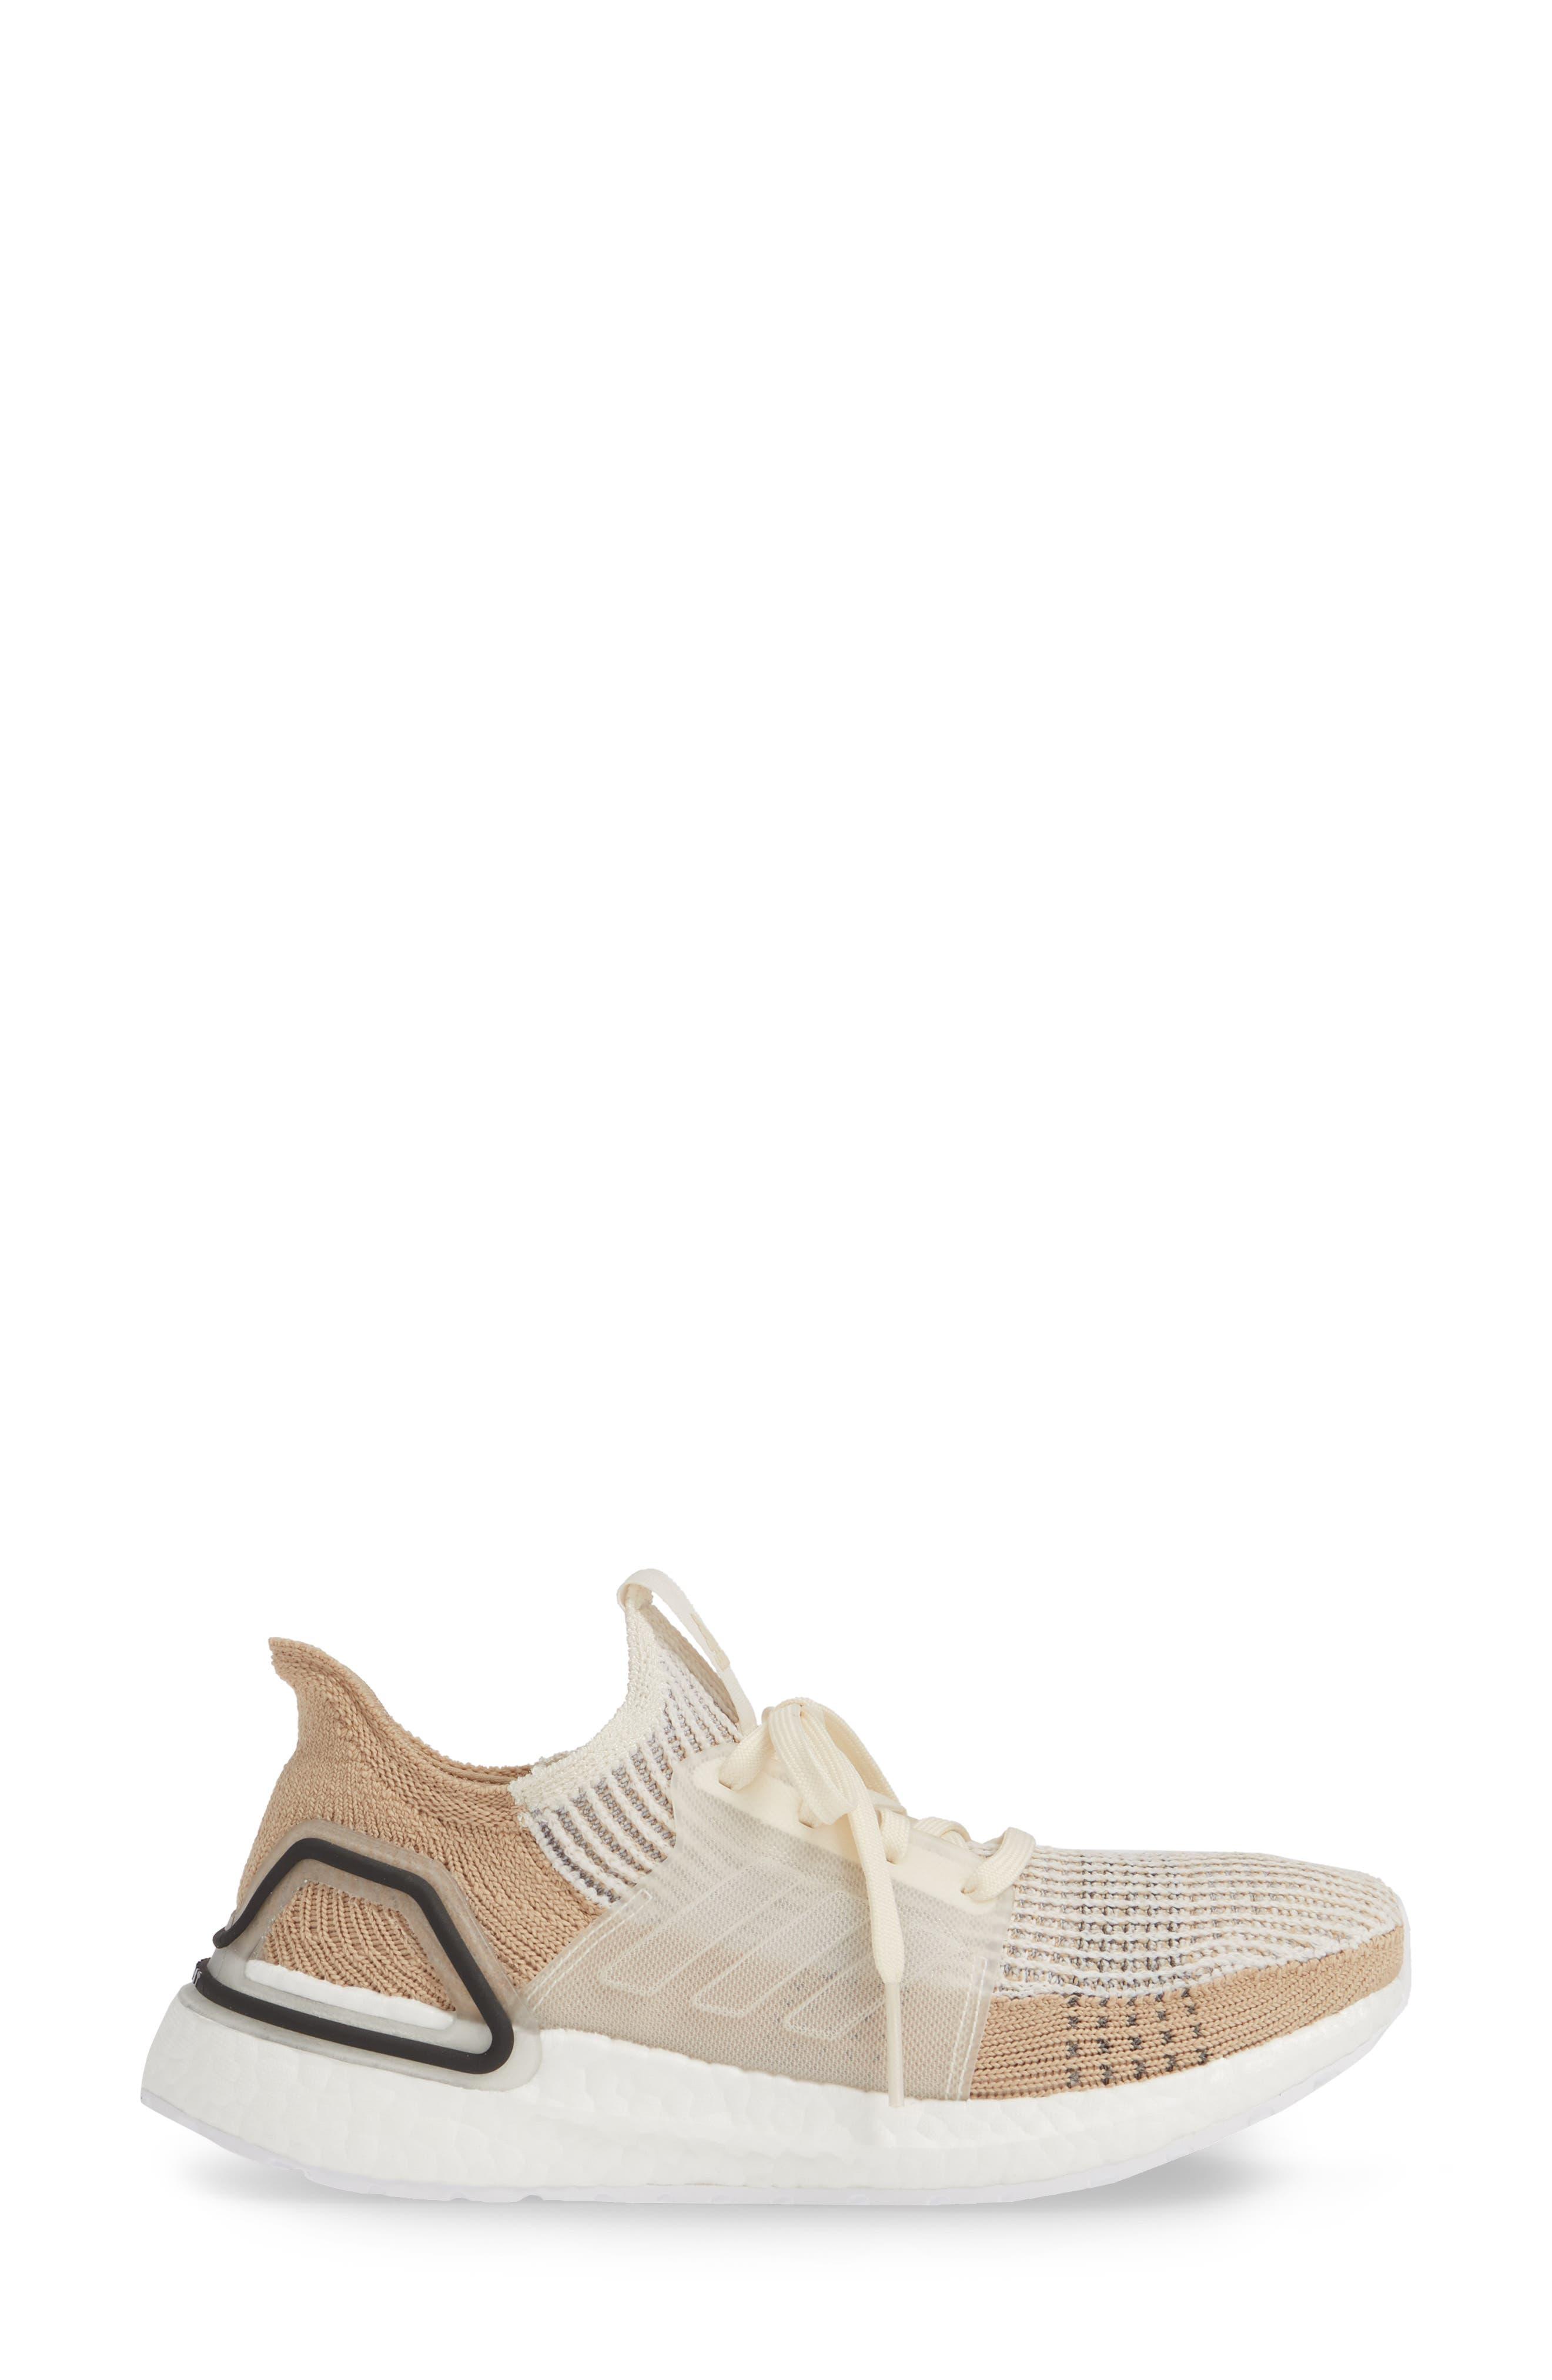 ADIDAS, UltraBoost 19 Running Shoe, Alternate thumbnail 3, color, CHALK WHITE/ PALE NUDE/ BLACK